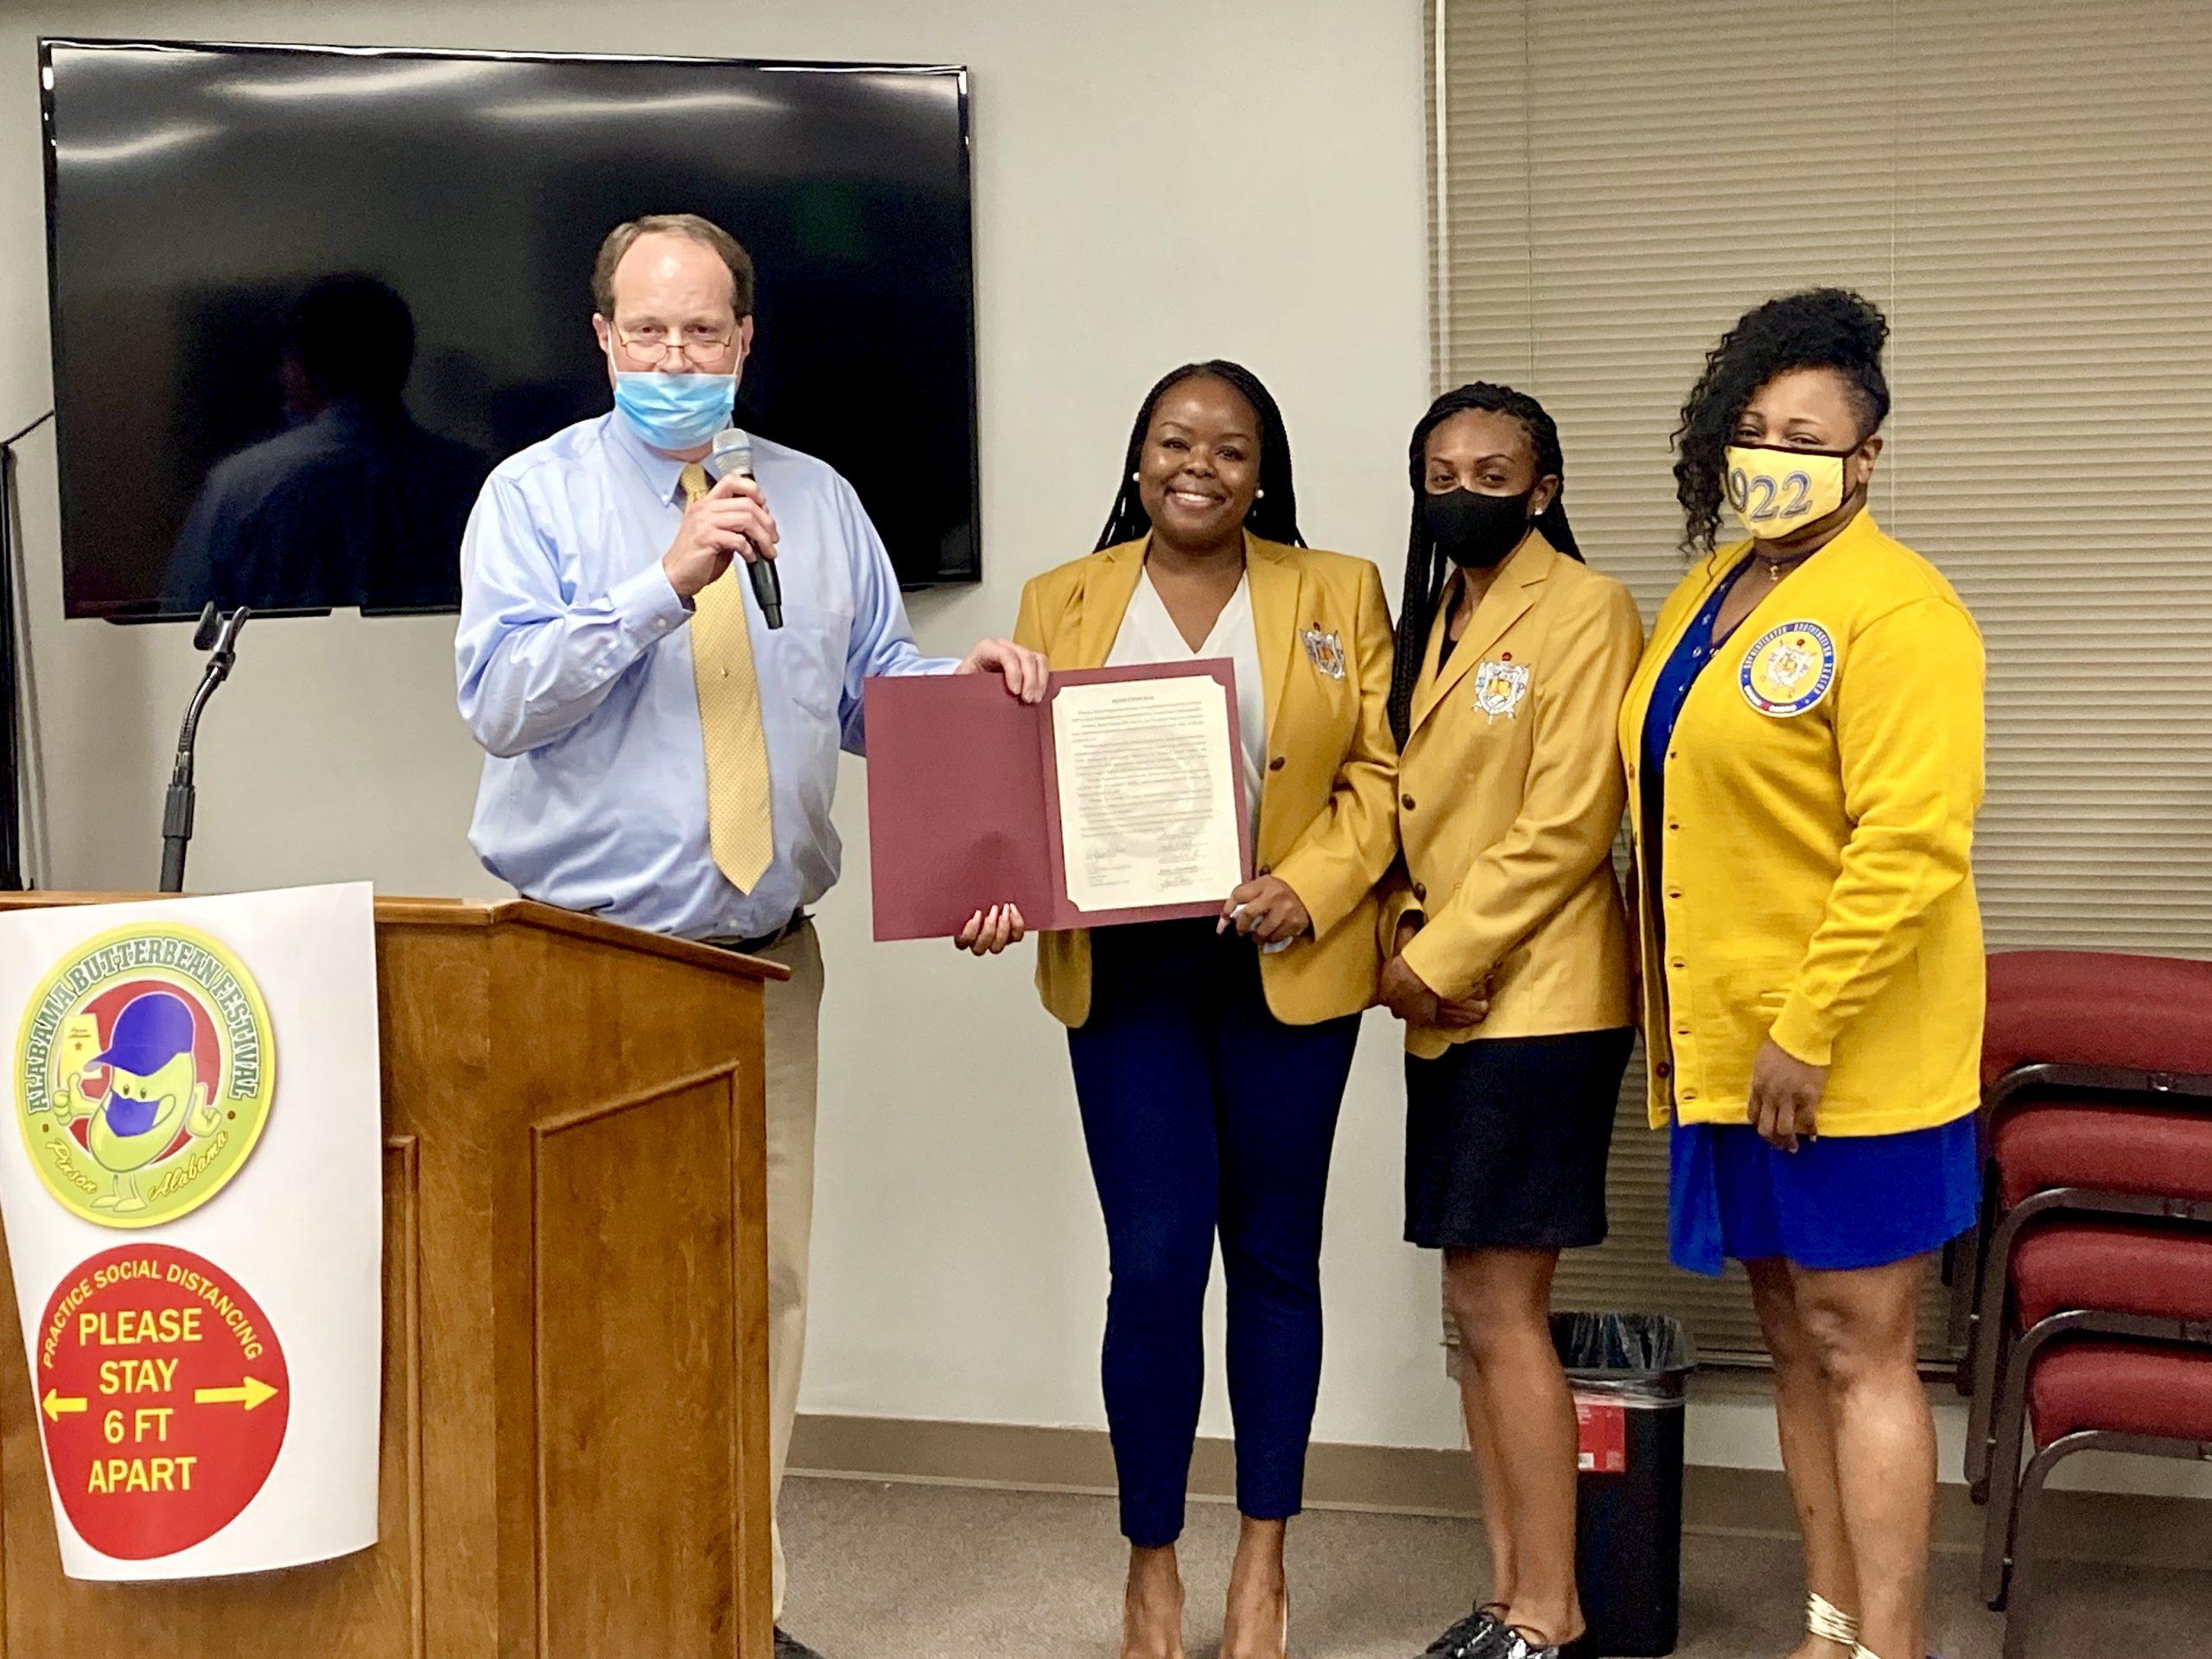 Pinson Council recognizes Lambda Eta Sigma Alumnae Chapter of Sigma Gamma Rho Sorority, Inc